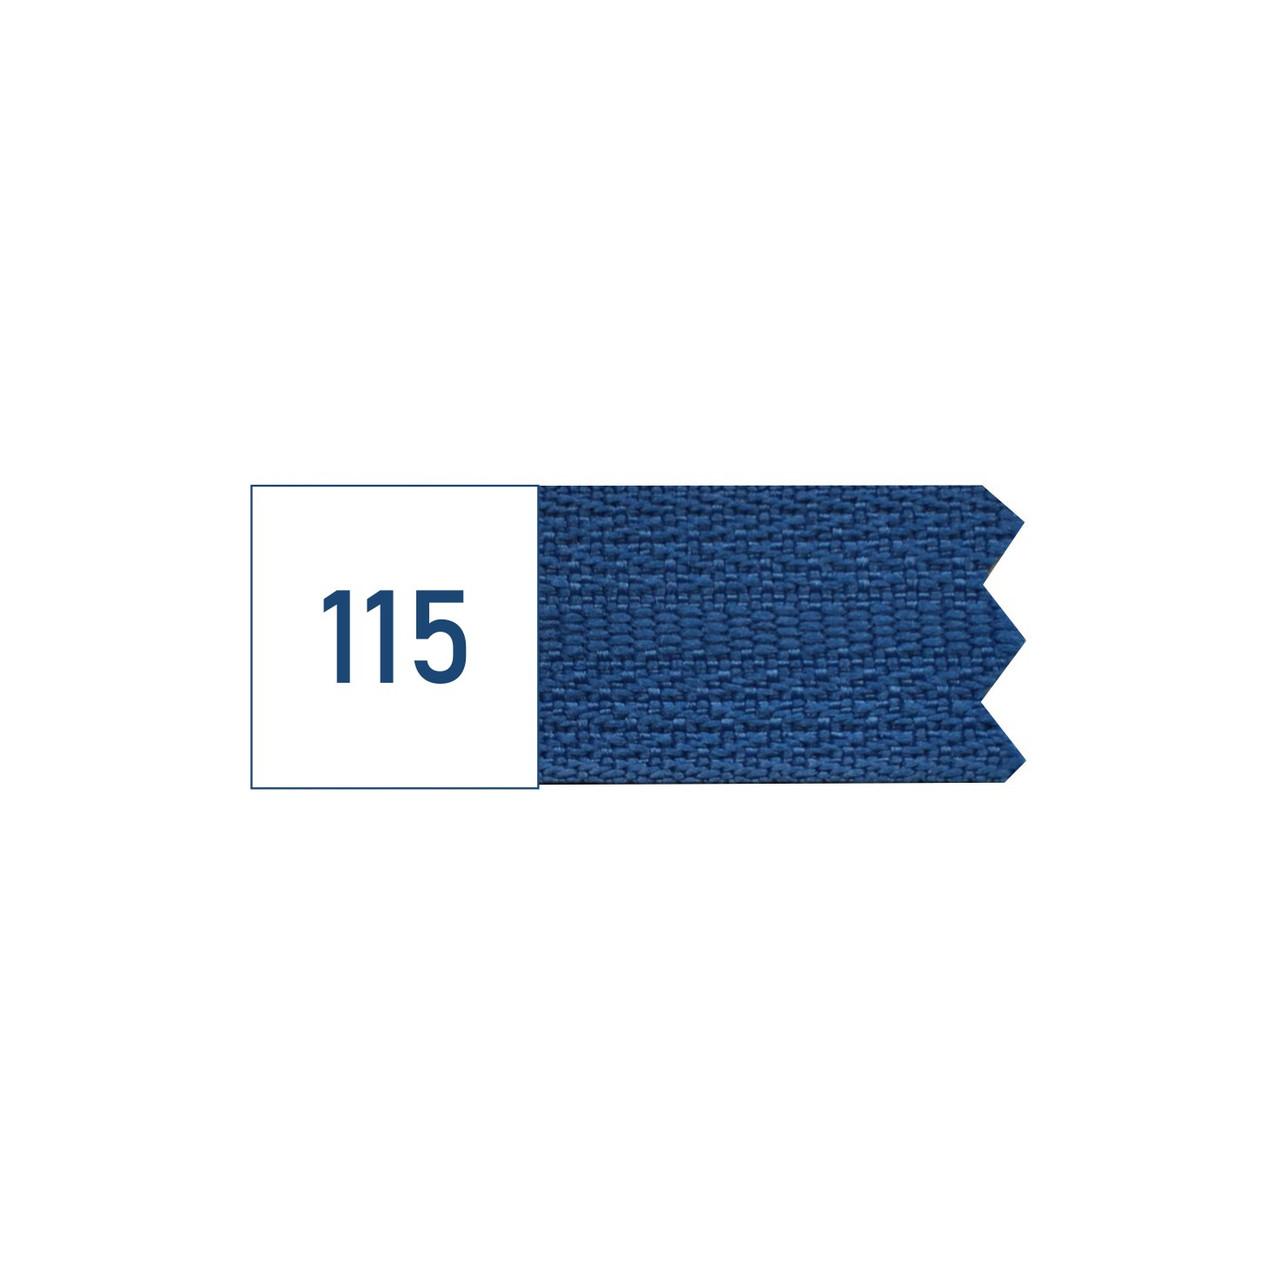 Молния спиральная №5 рулонная S-115 синий яркий (рул 200м) ZIP